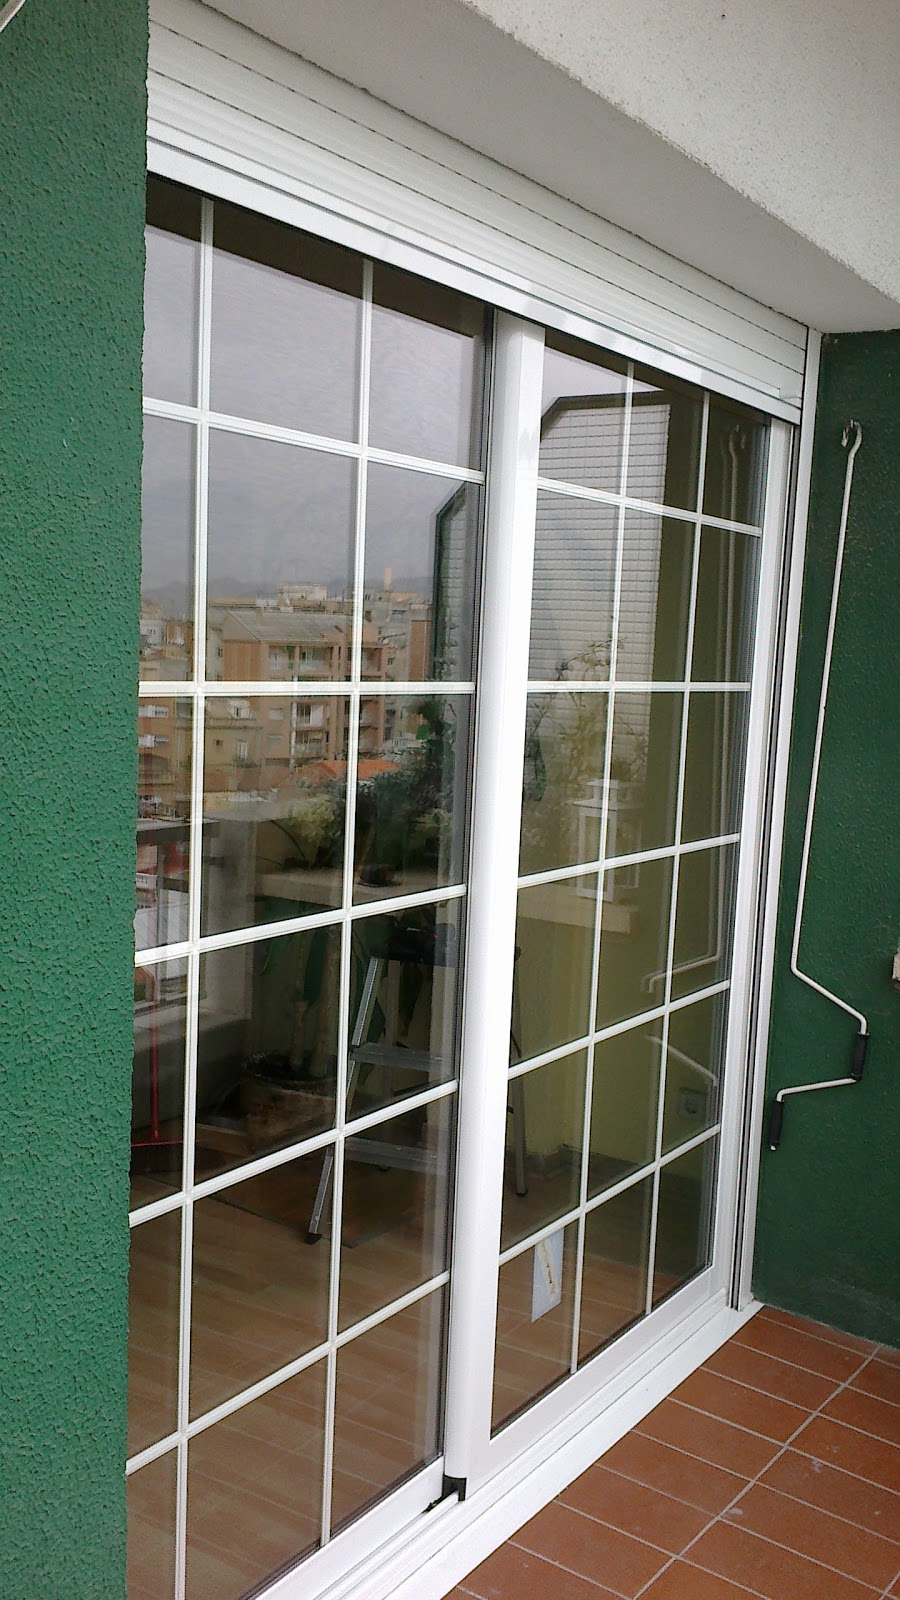 V i c a r for Mosquiteras puertas abatibles terraza